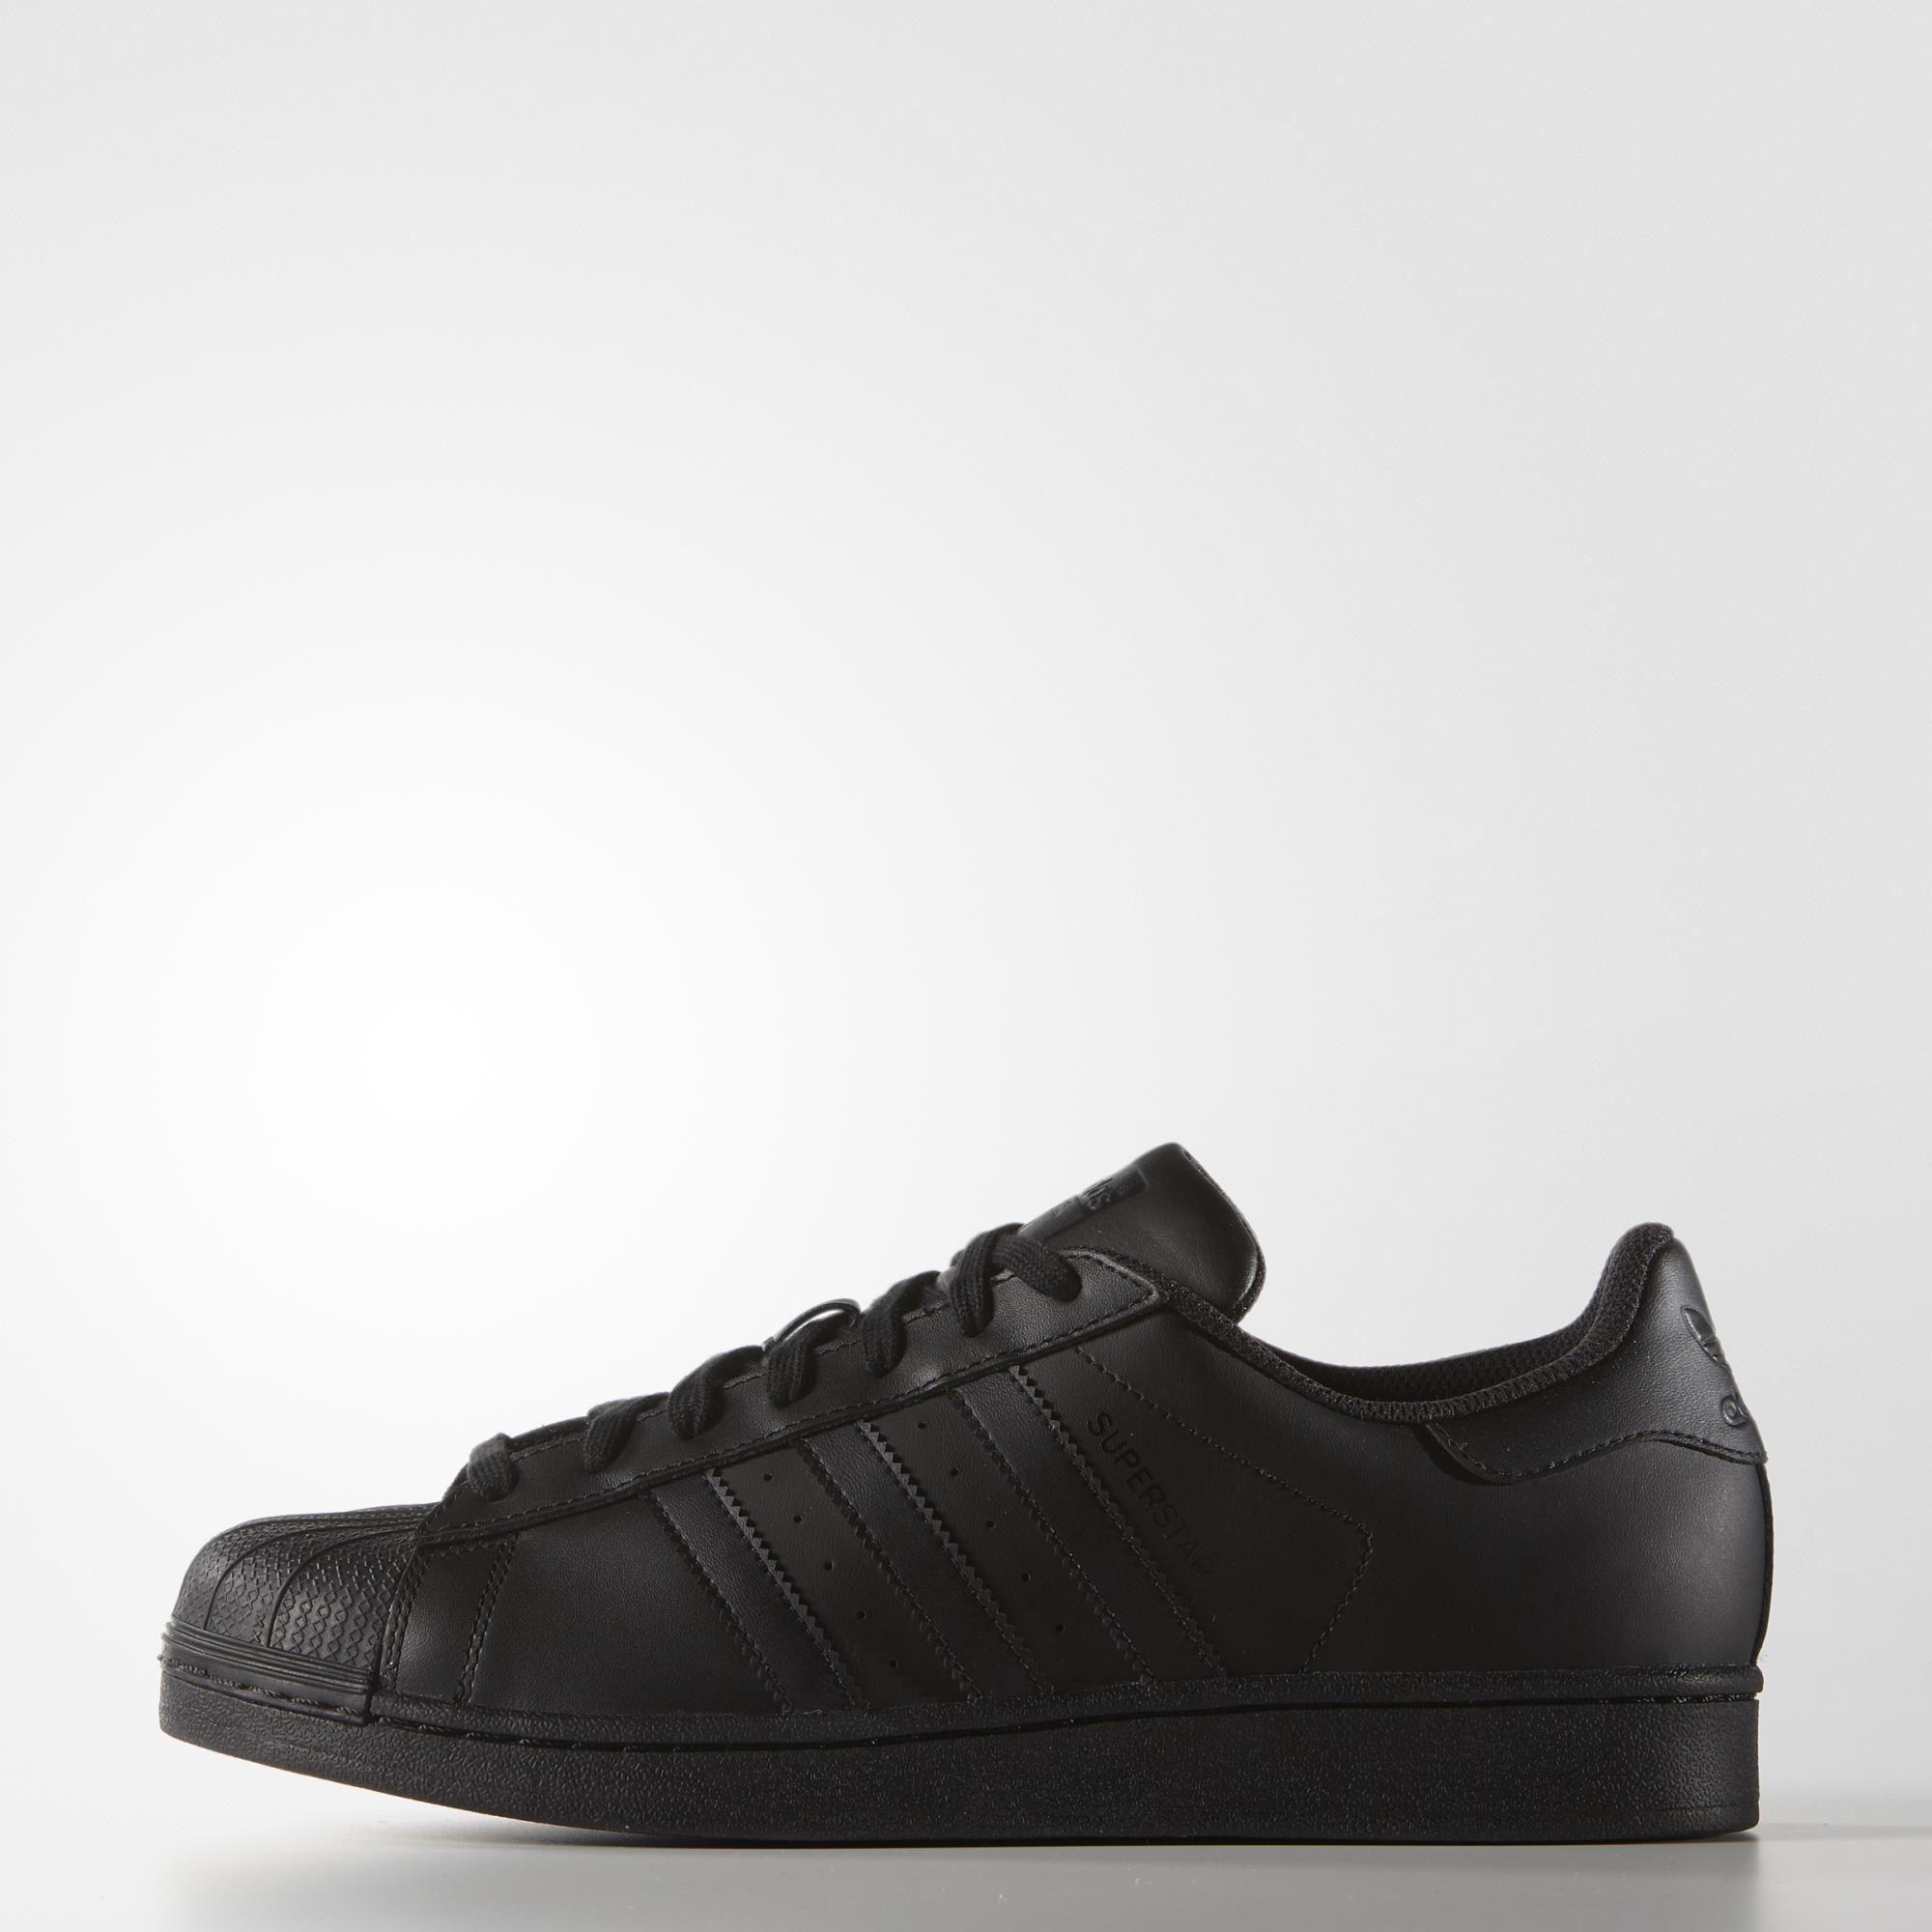 5a3aab147ef15 adidas Superstar Foundation Shoes - Black